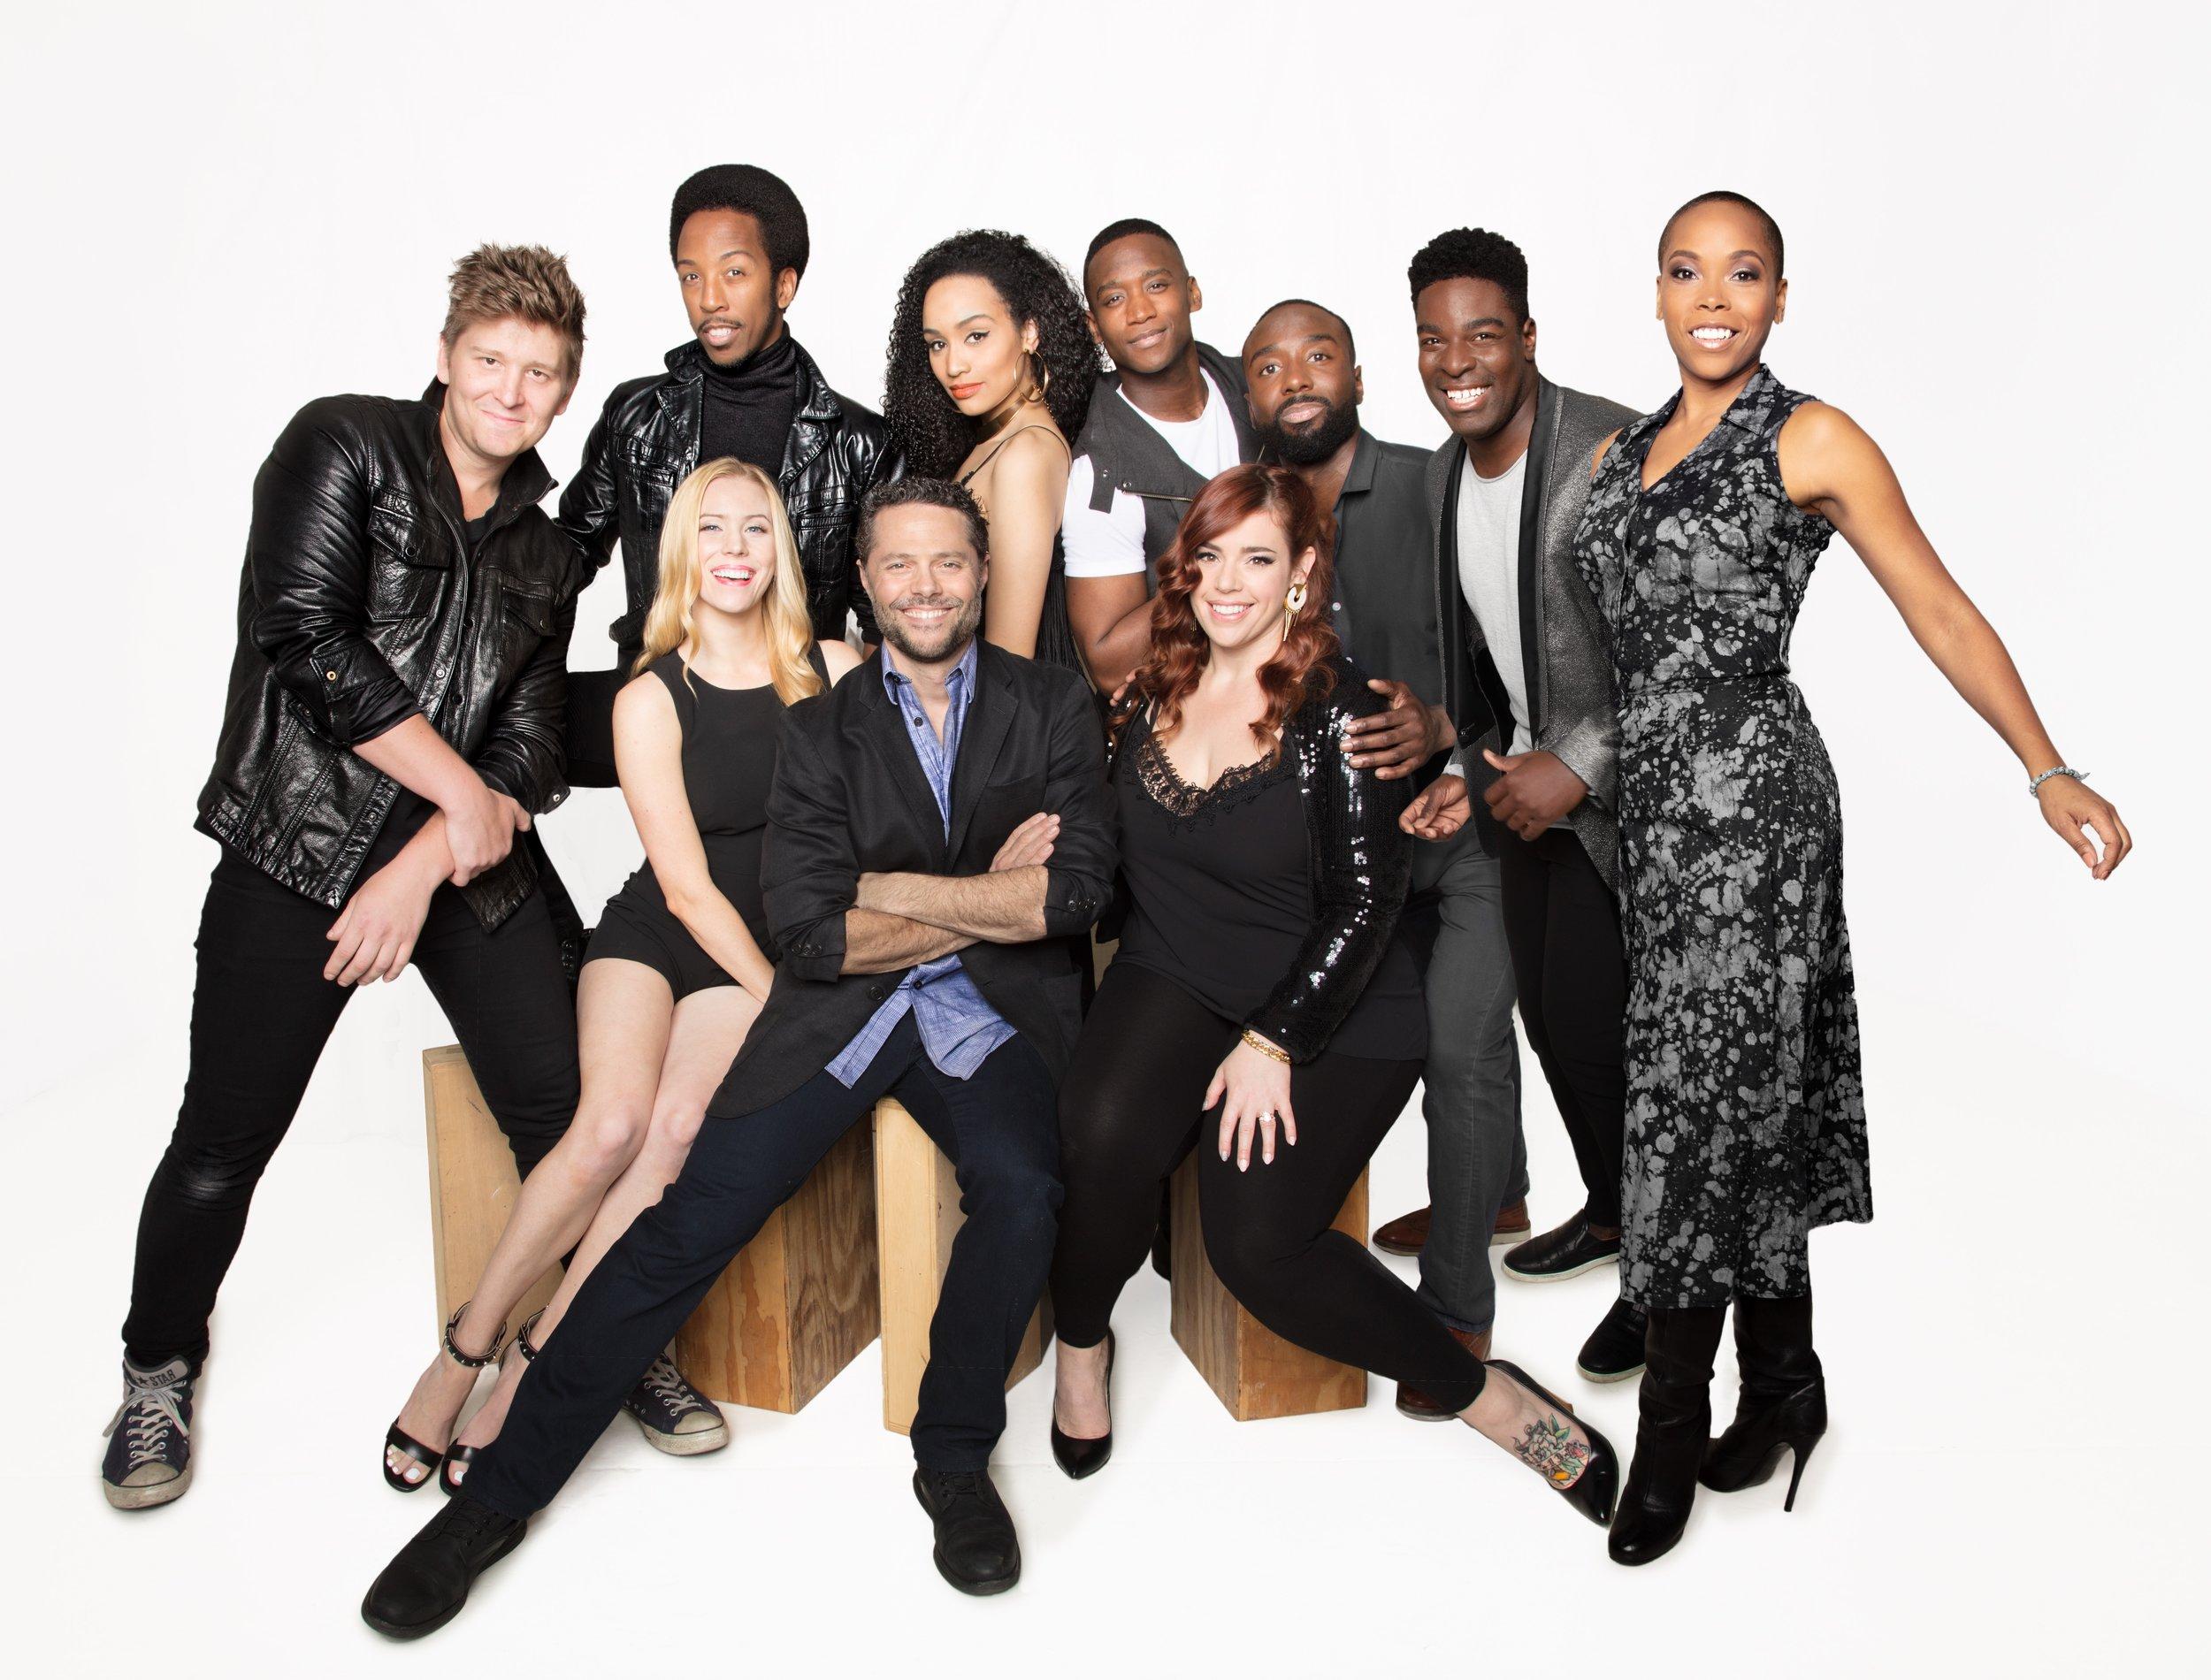 The cast of Smokey Joe's Cafe with Director/Choreographer Josh Bergasse (front center). Photo by Joseph Moran.